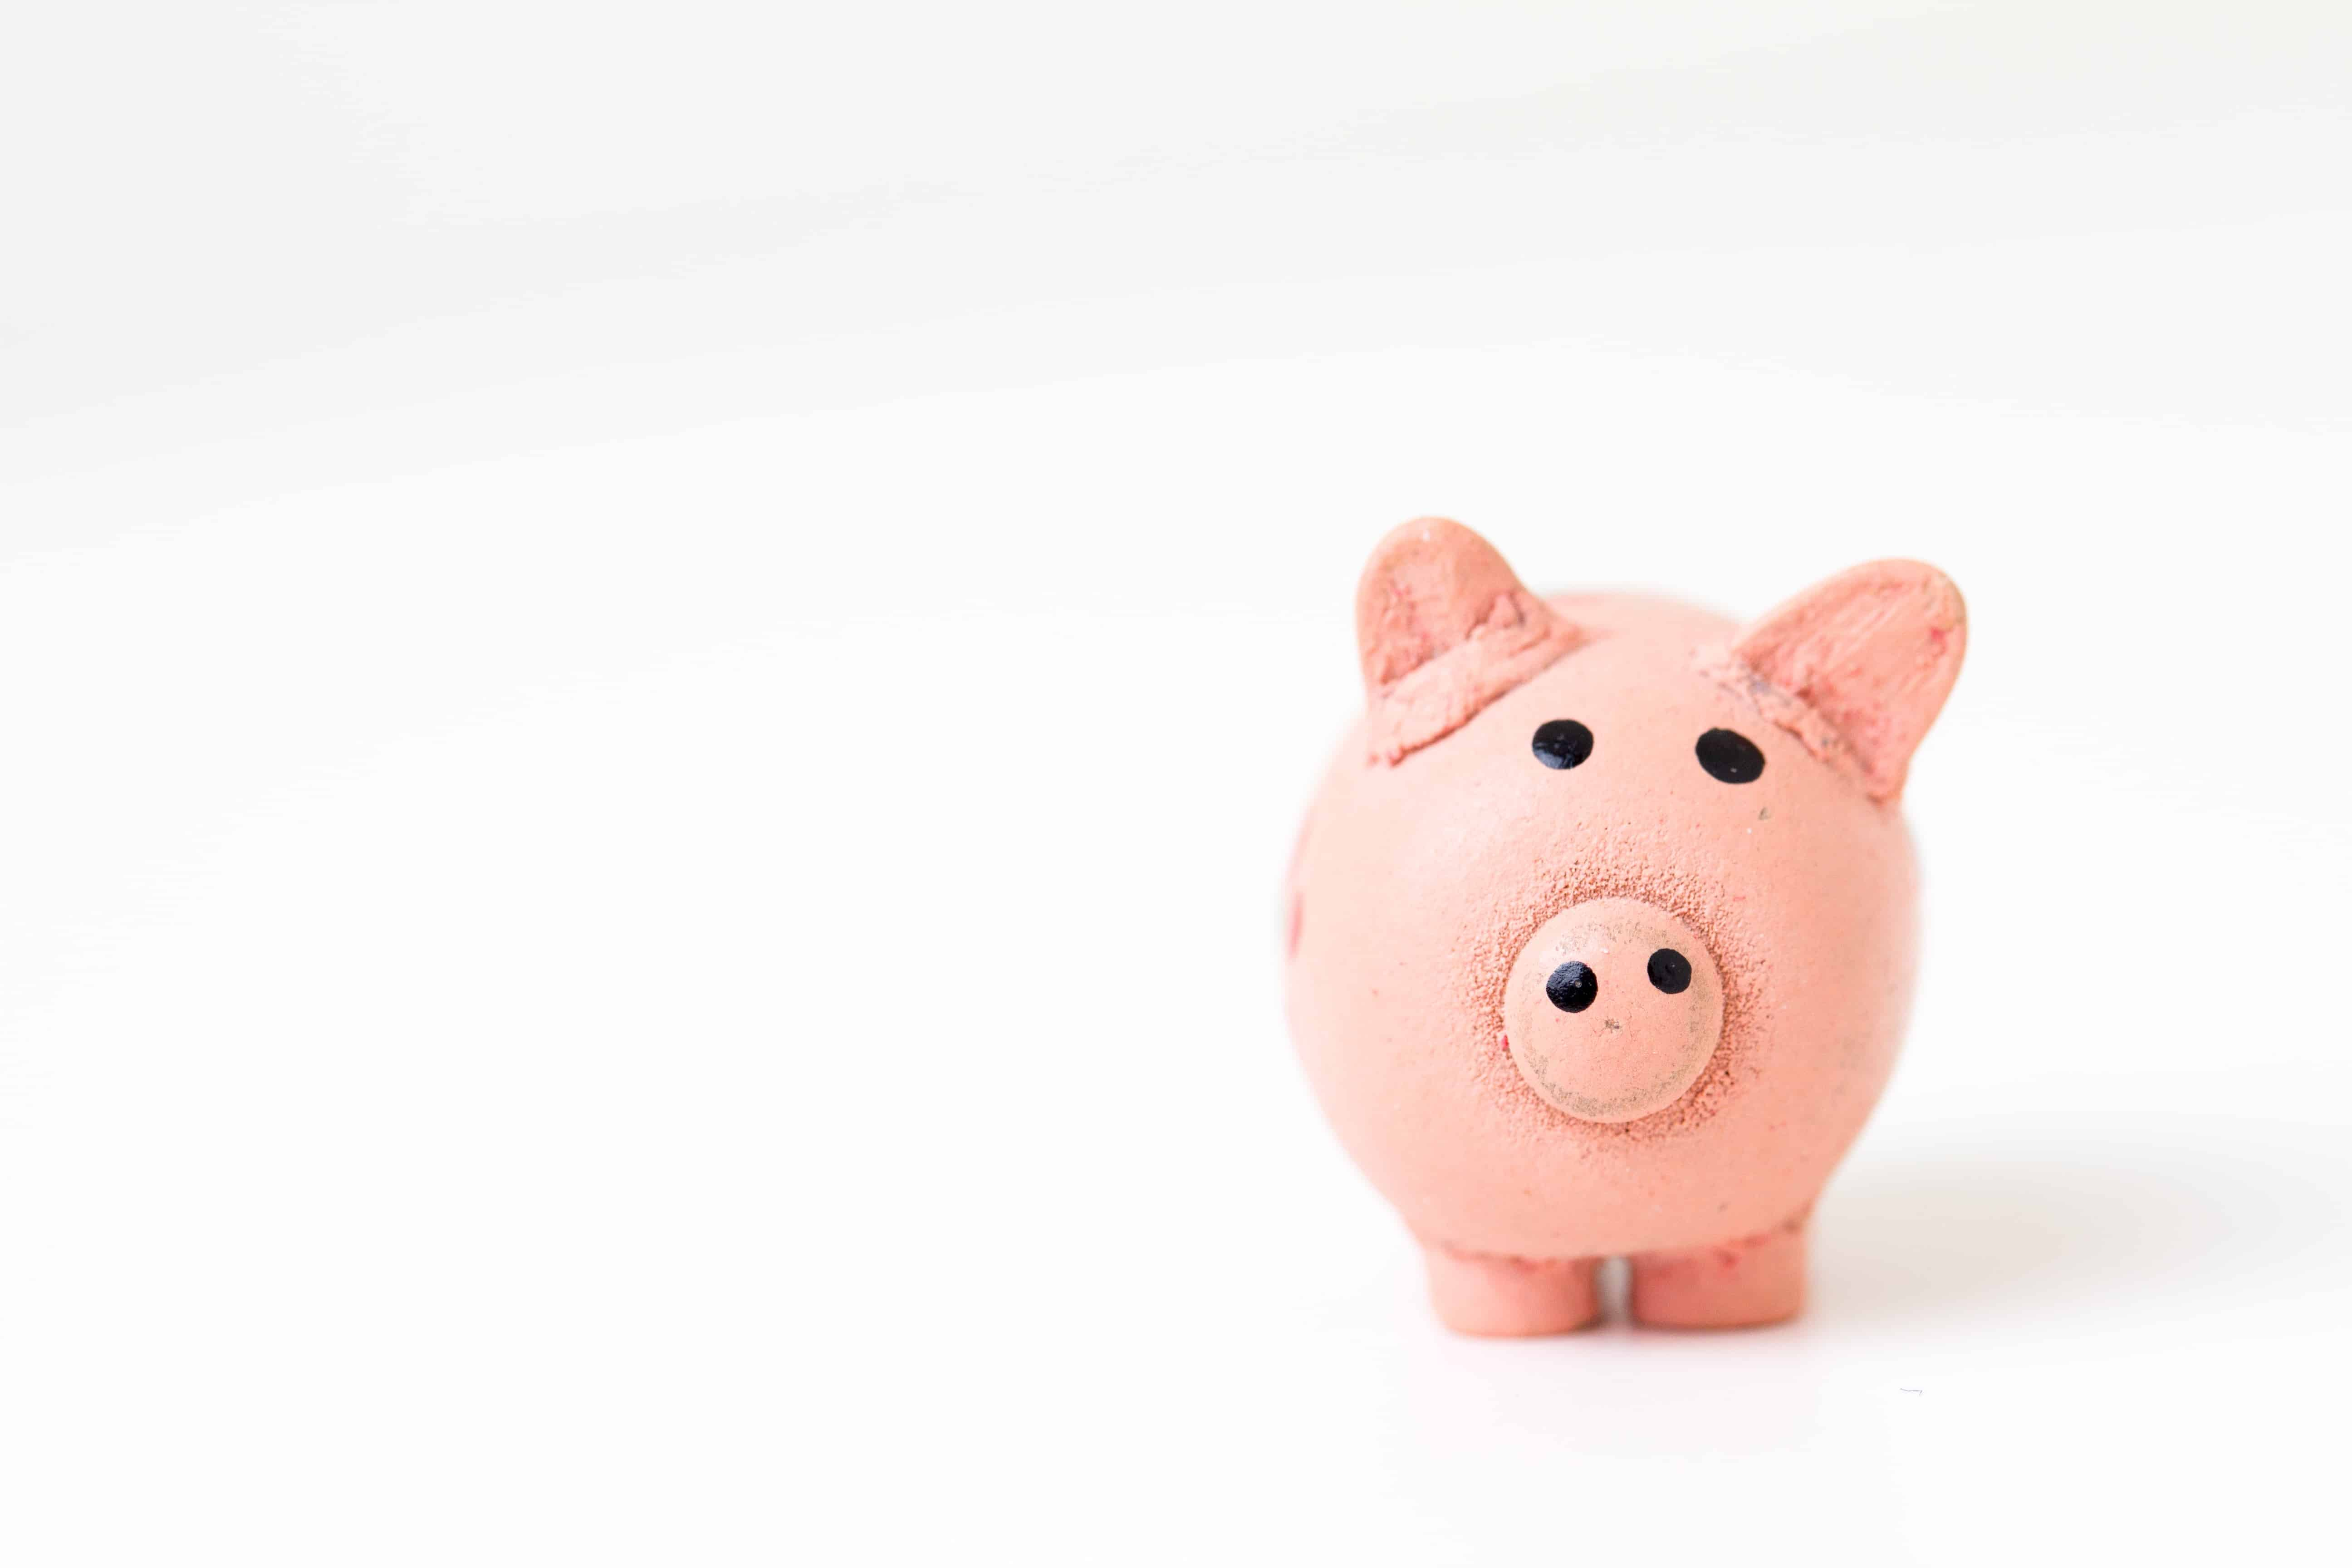 13 Creative Ways to save Money on Your Internet Bill